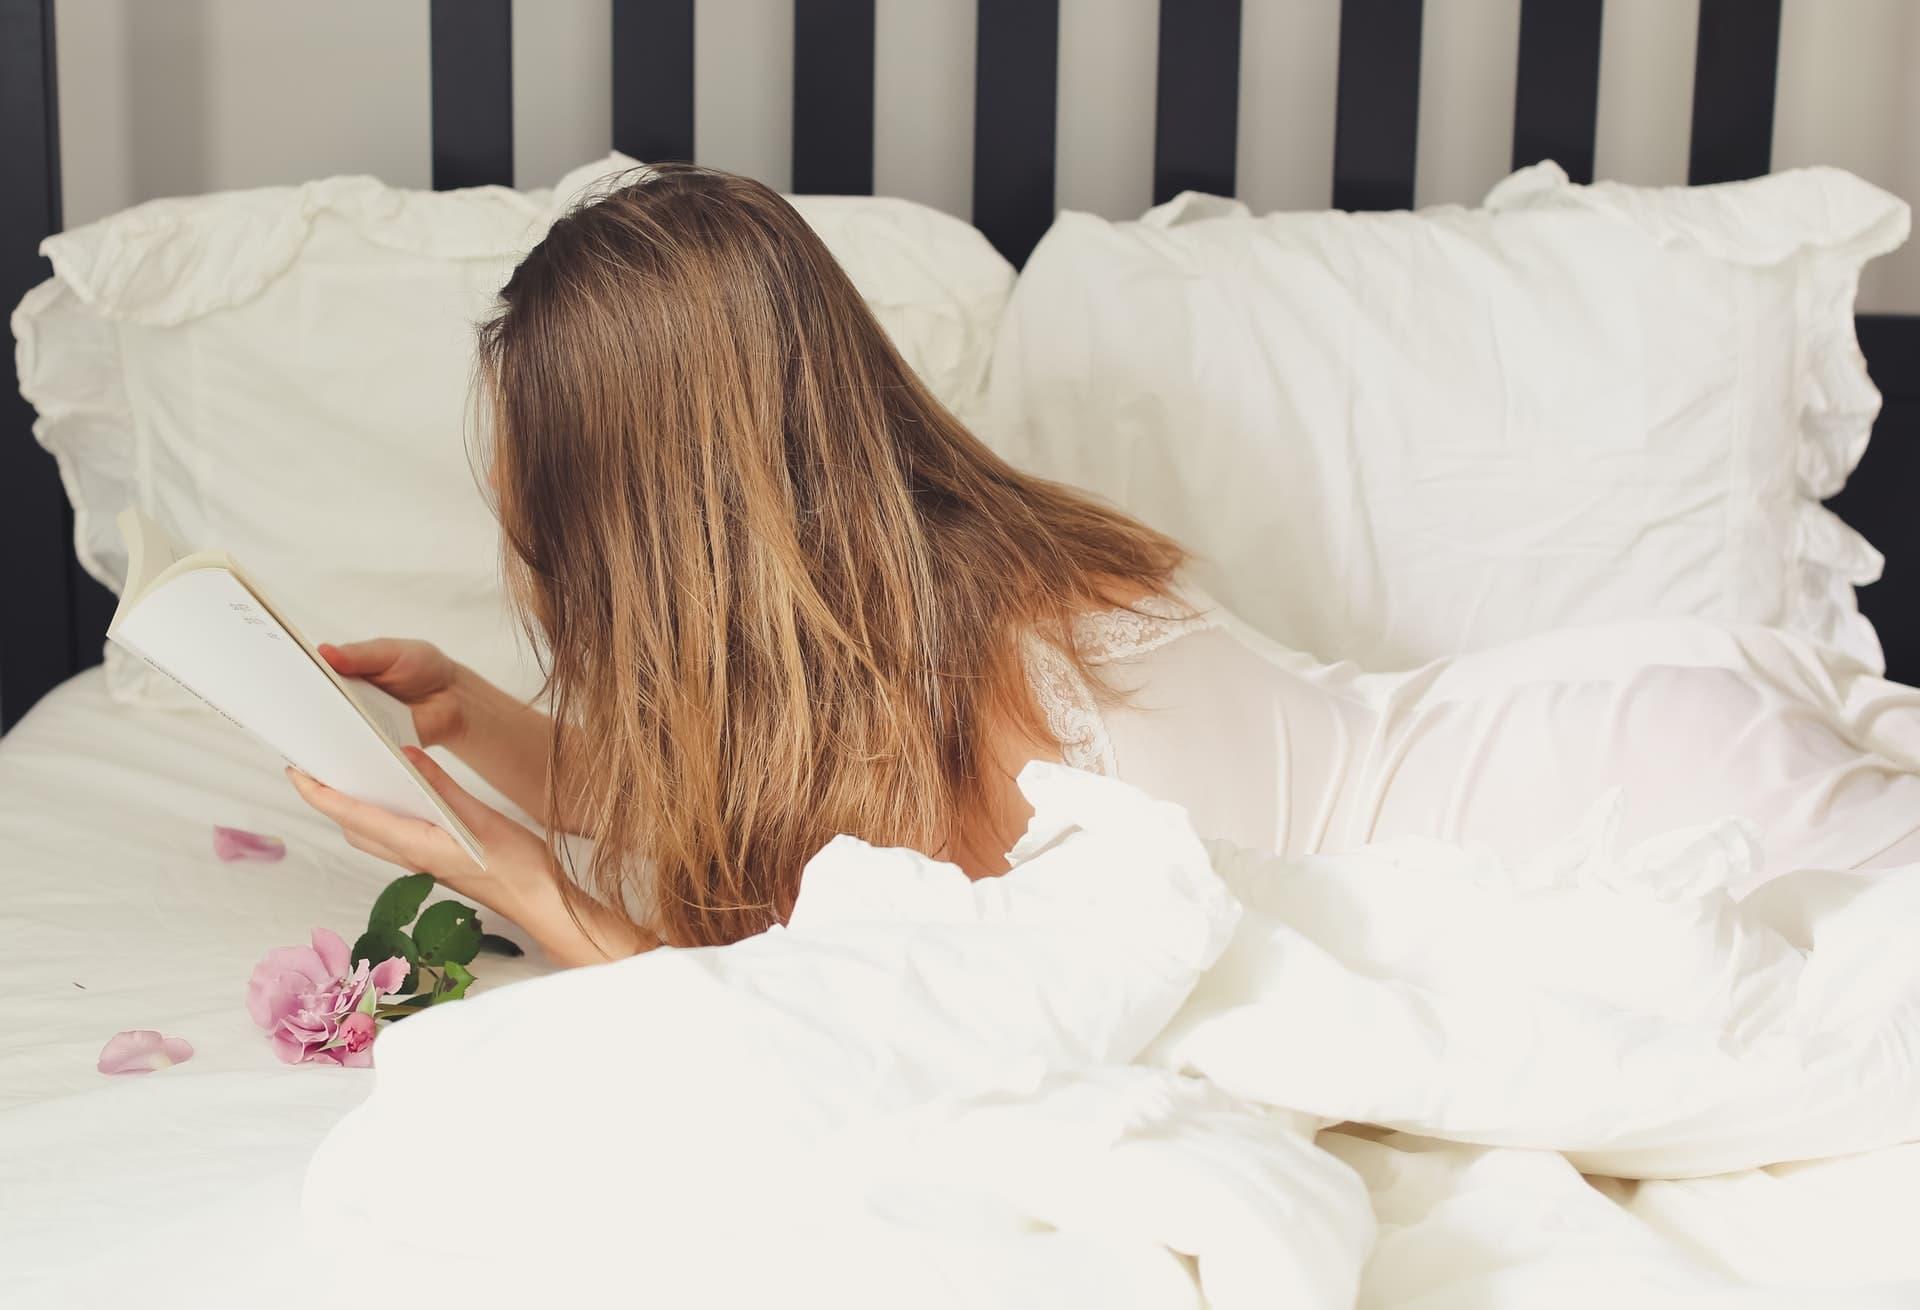 sleep and beauty tips